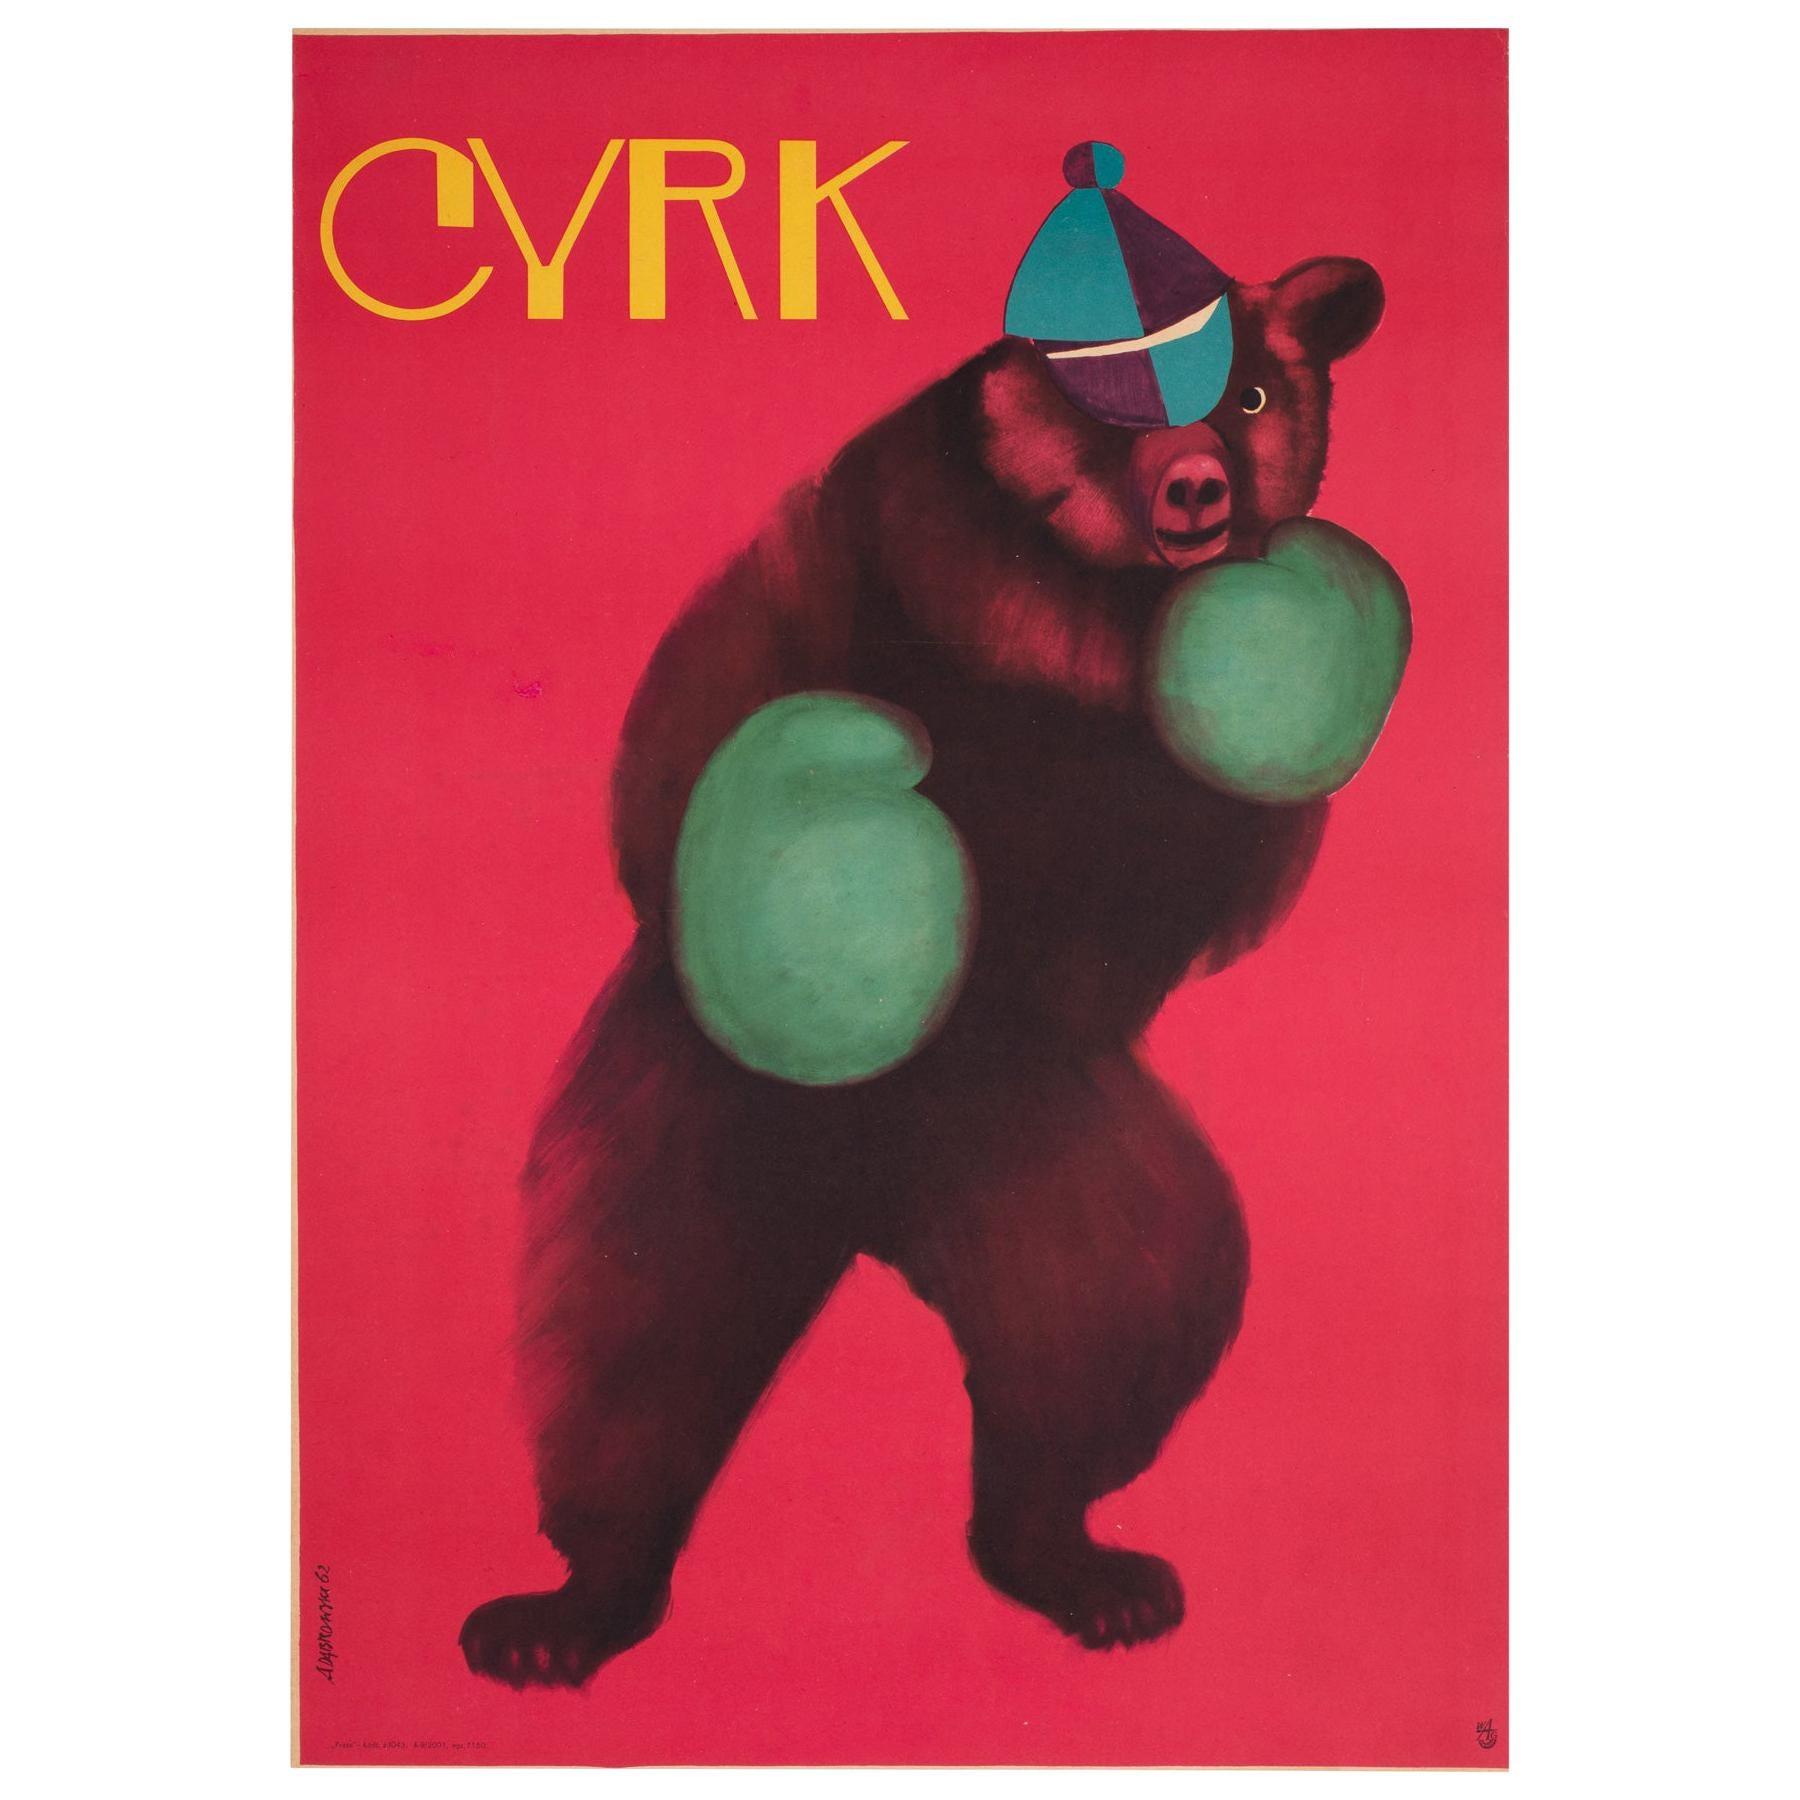 Cyrk Boxing Bear 1962 Polish Circus Poster, Onegin-Dabrowski, Linen Backed